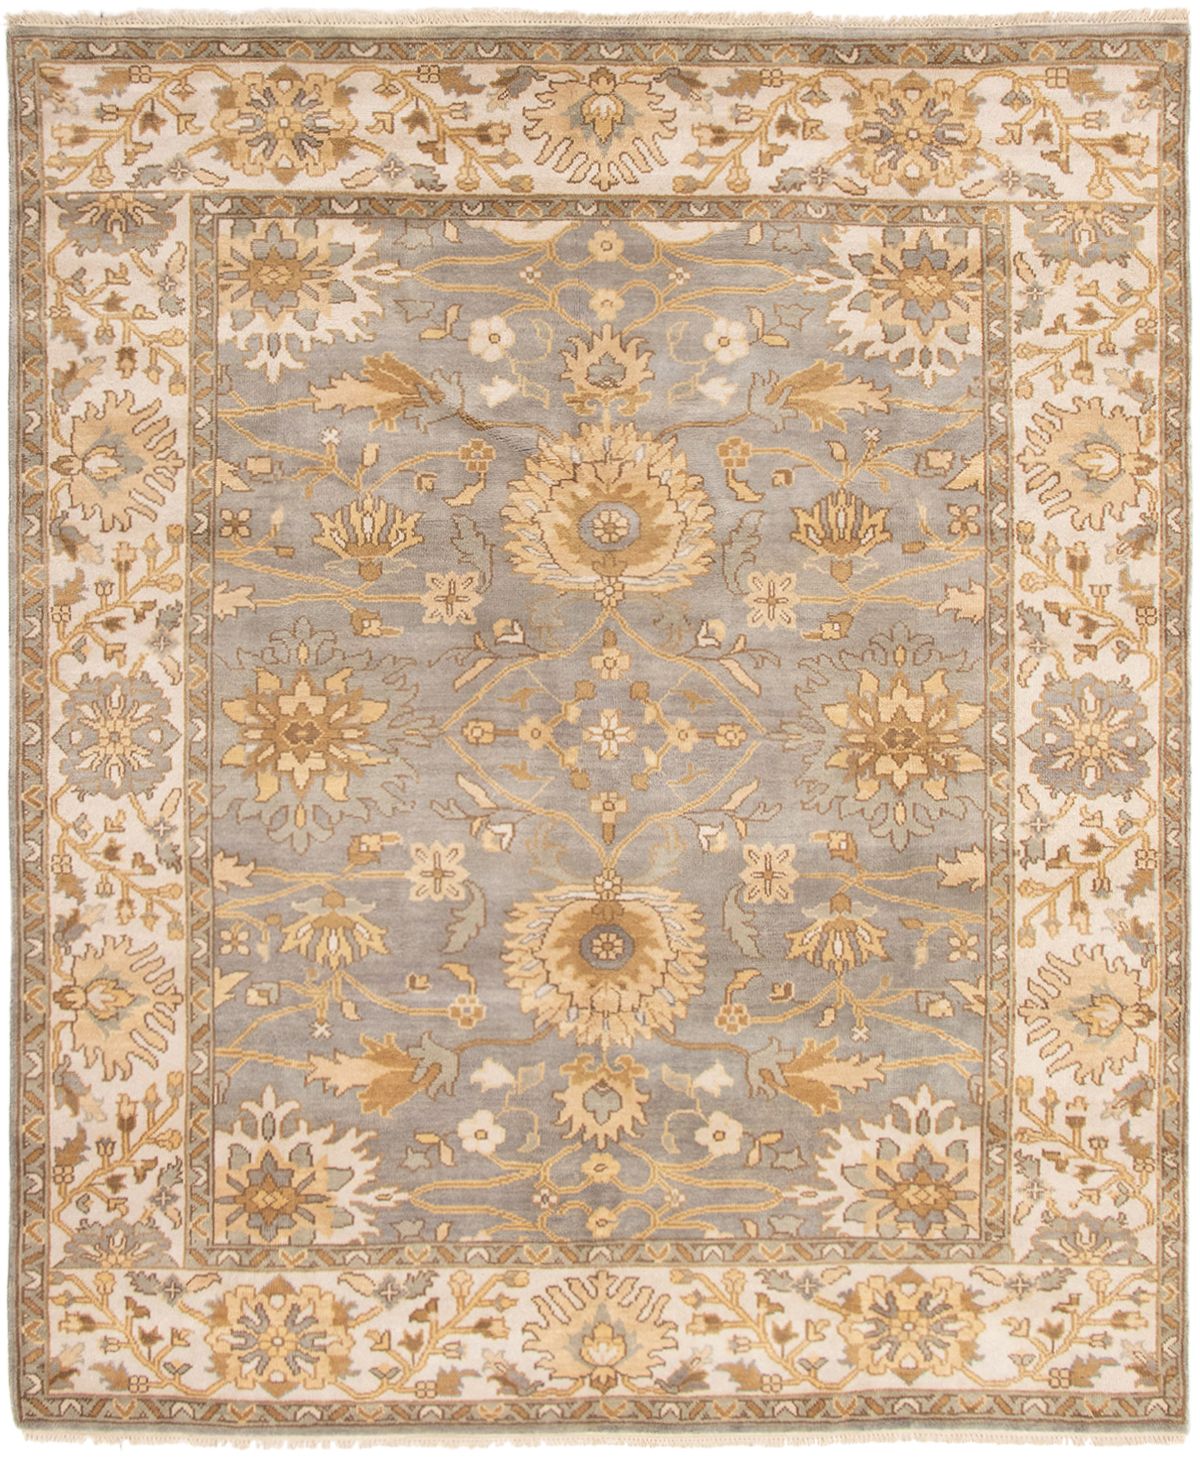 "Hand-knotted Royal Ushak Grey Wool Rug 8'3"" x 10'1"" Size: 8'3"" x 10'1"""